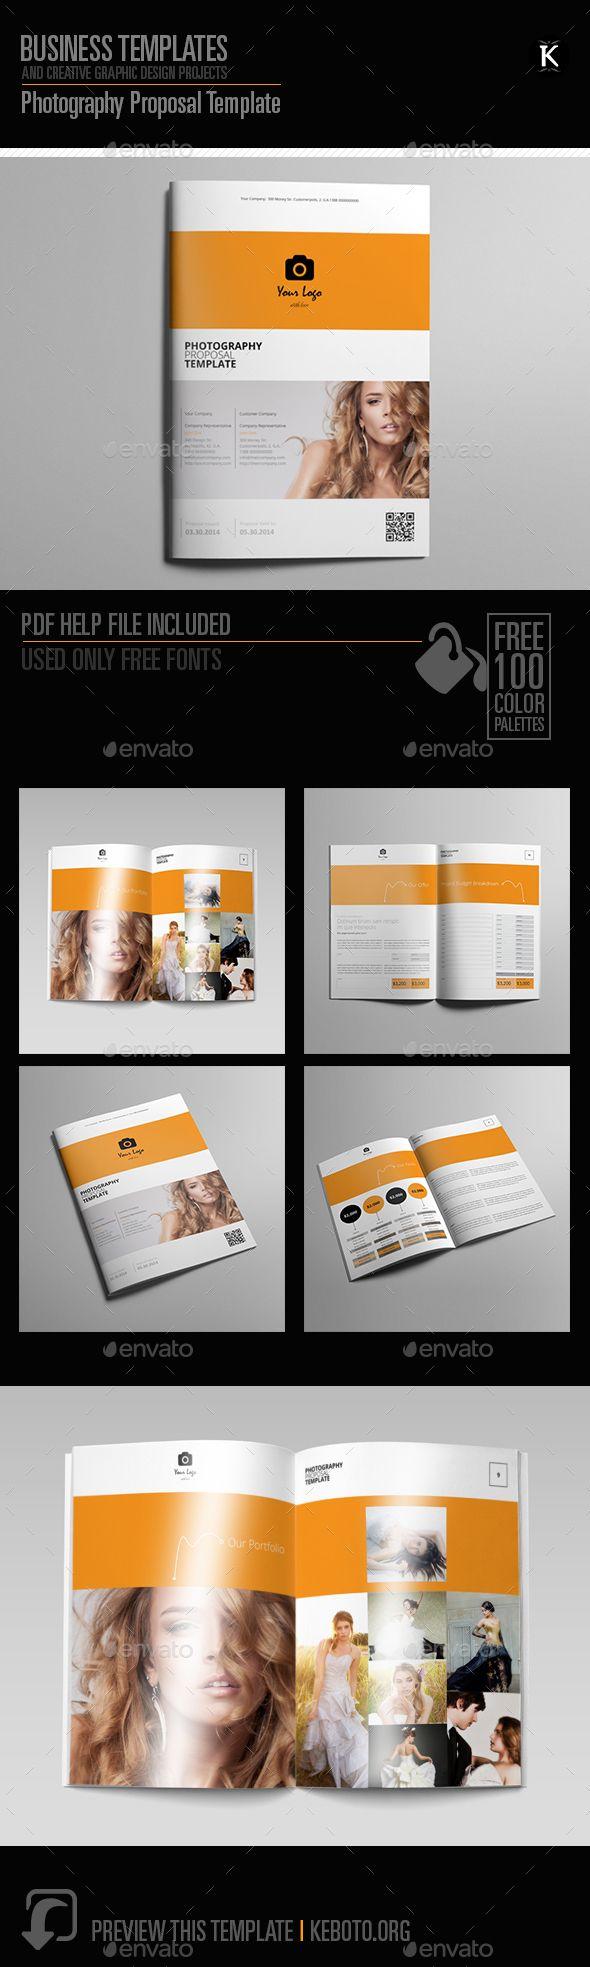 best 20 invoice format ideas on pinterest. Black Bedroom Furniture Sets. Home Design Ideas